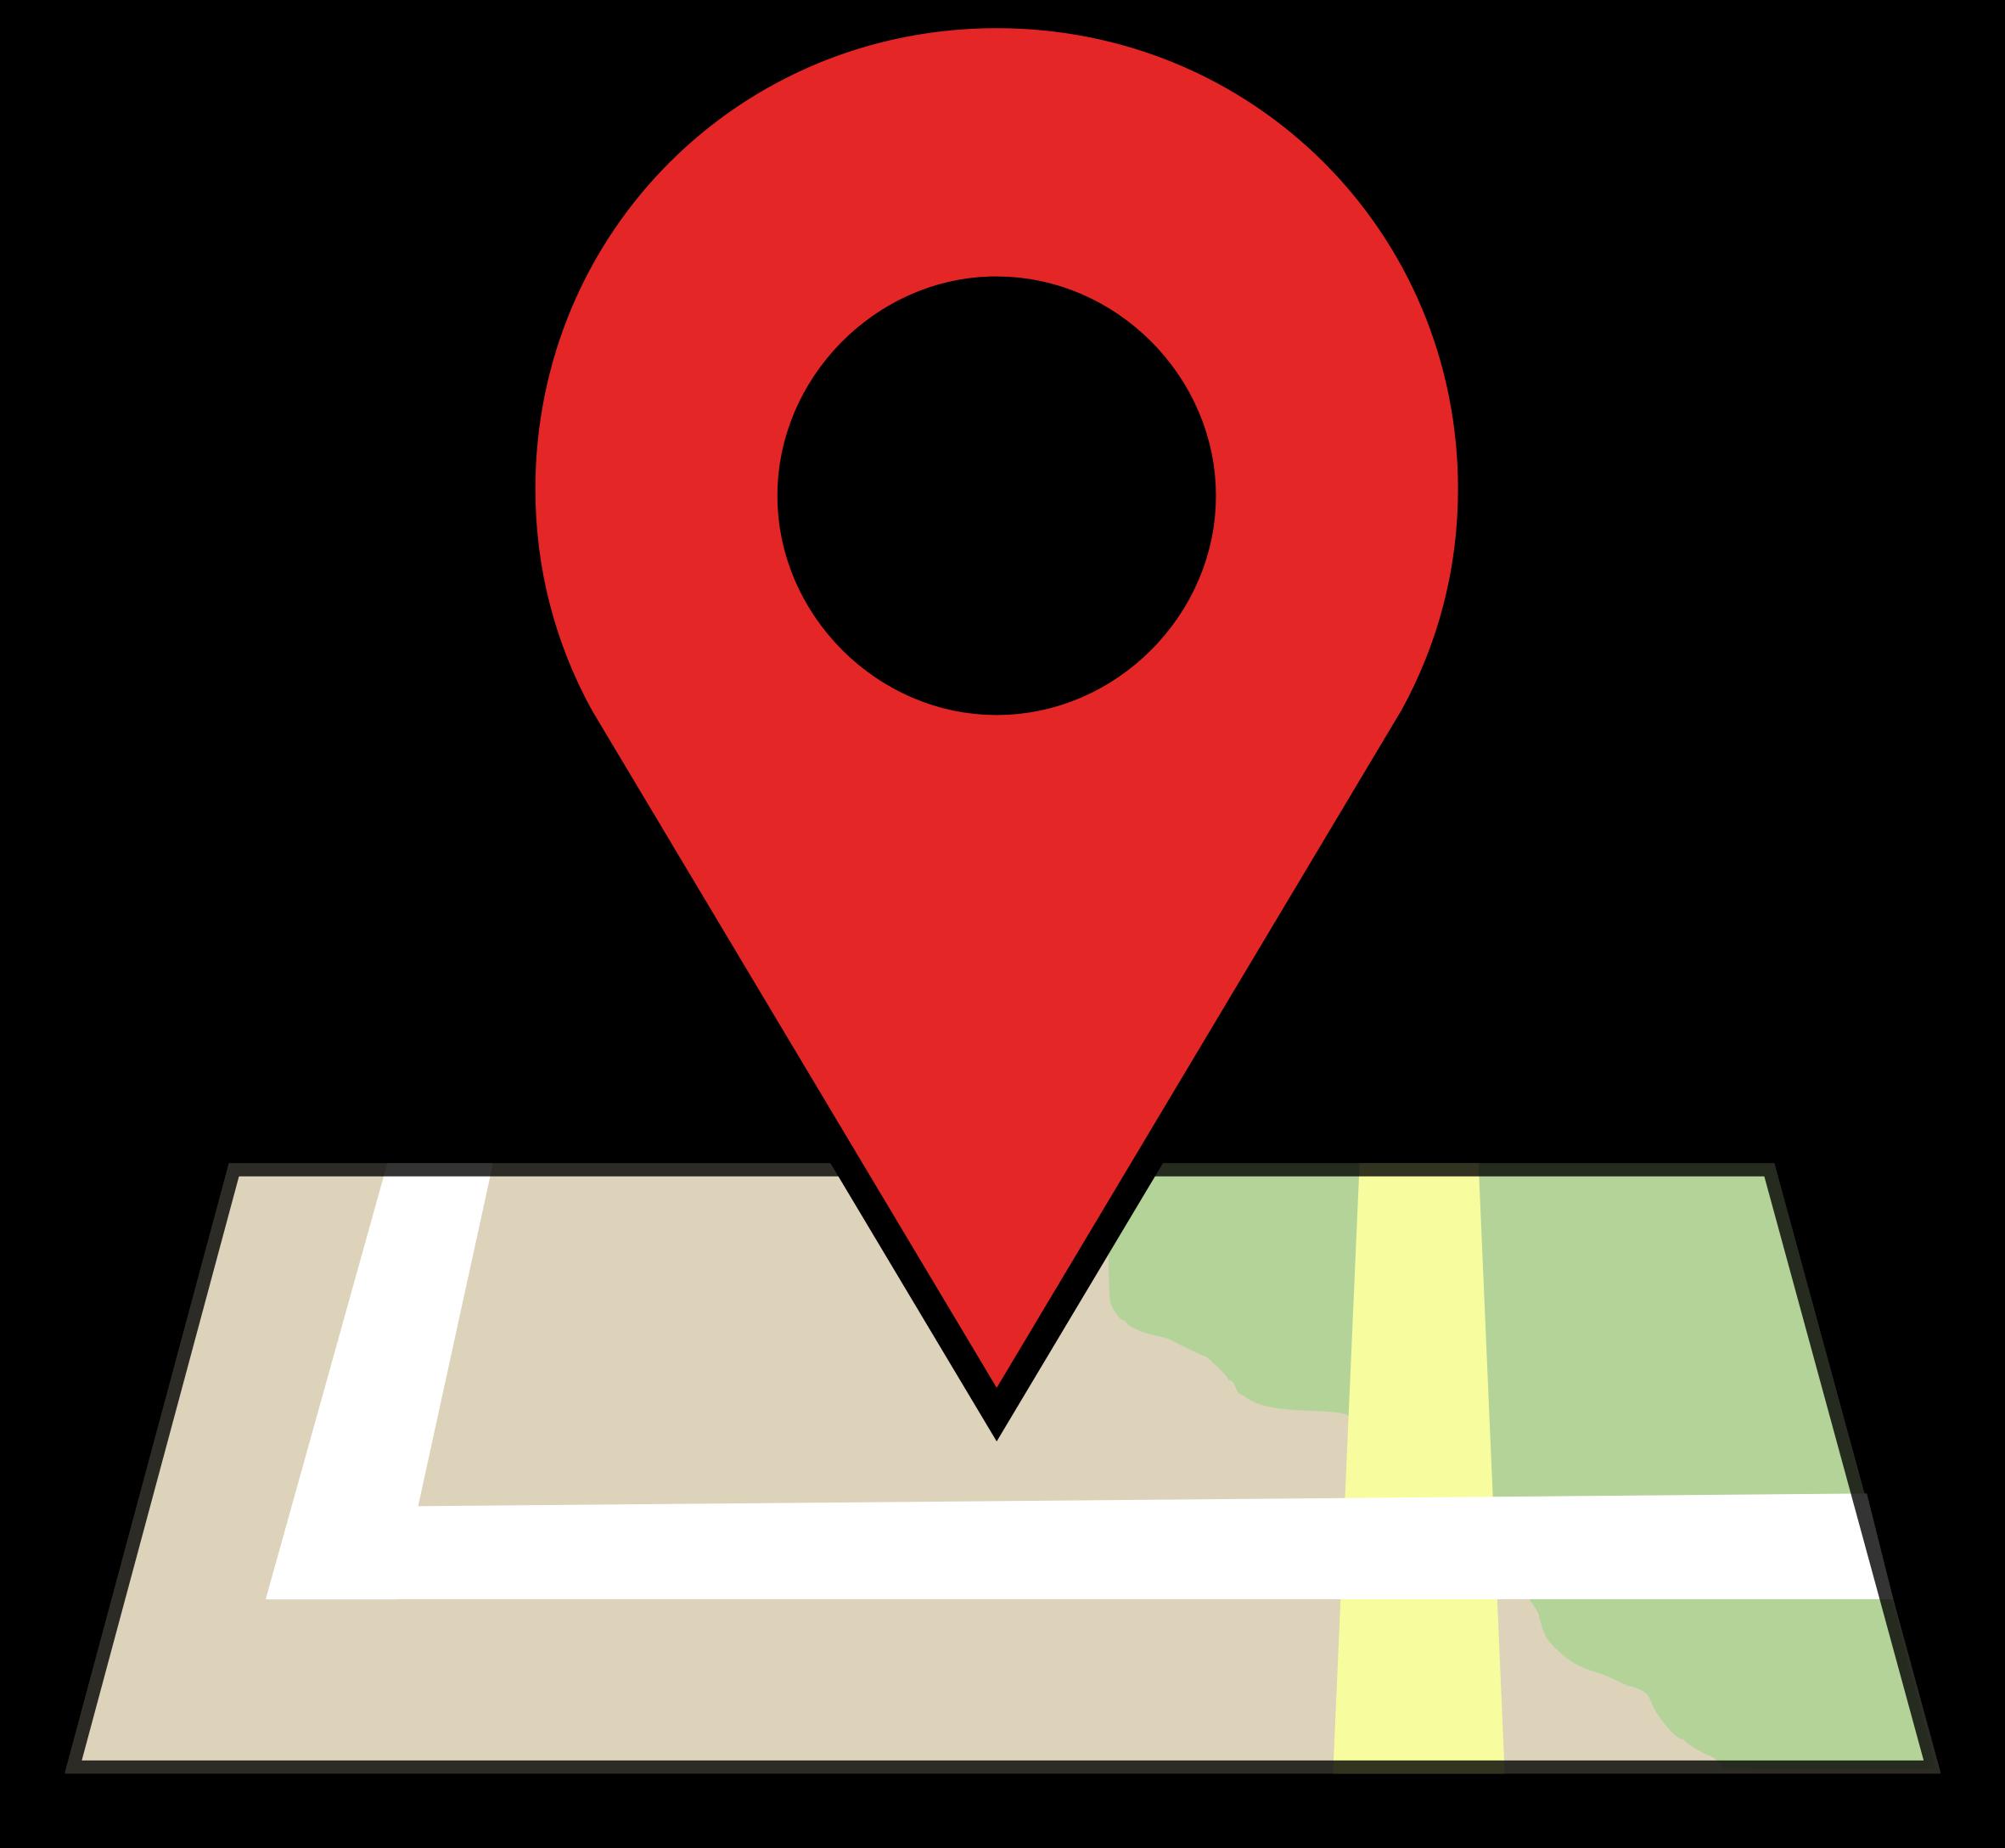 Clip art panda free. Location clipart